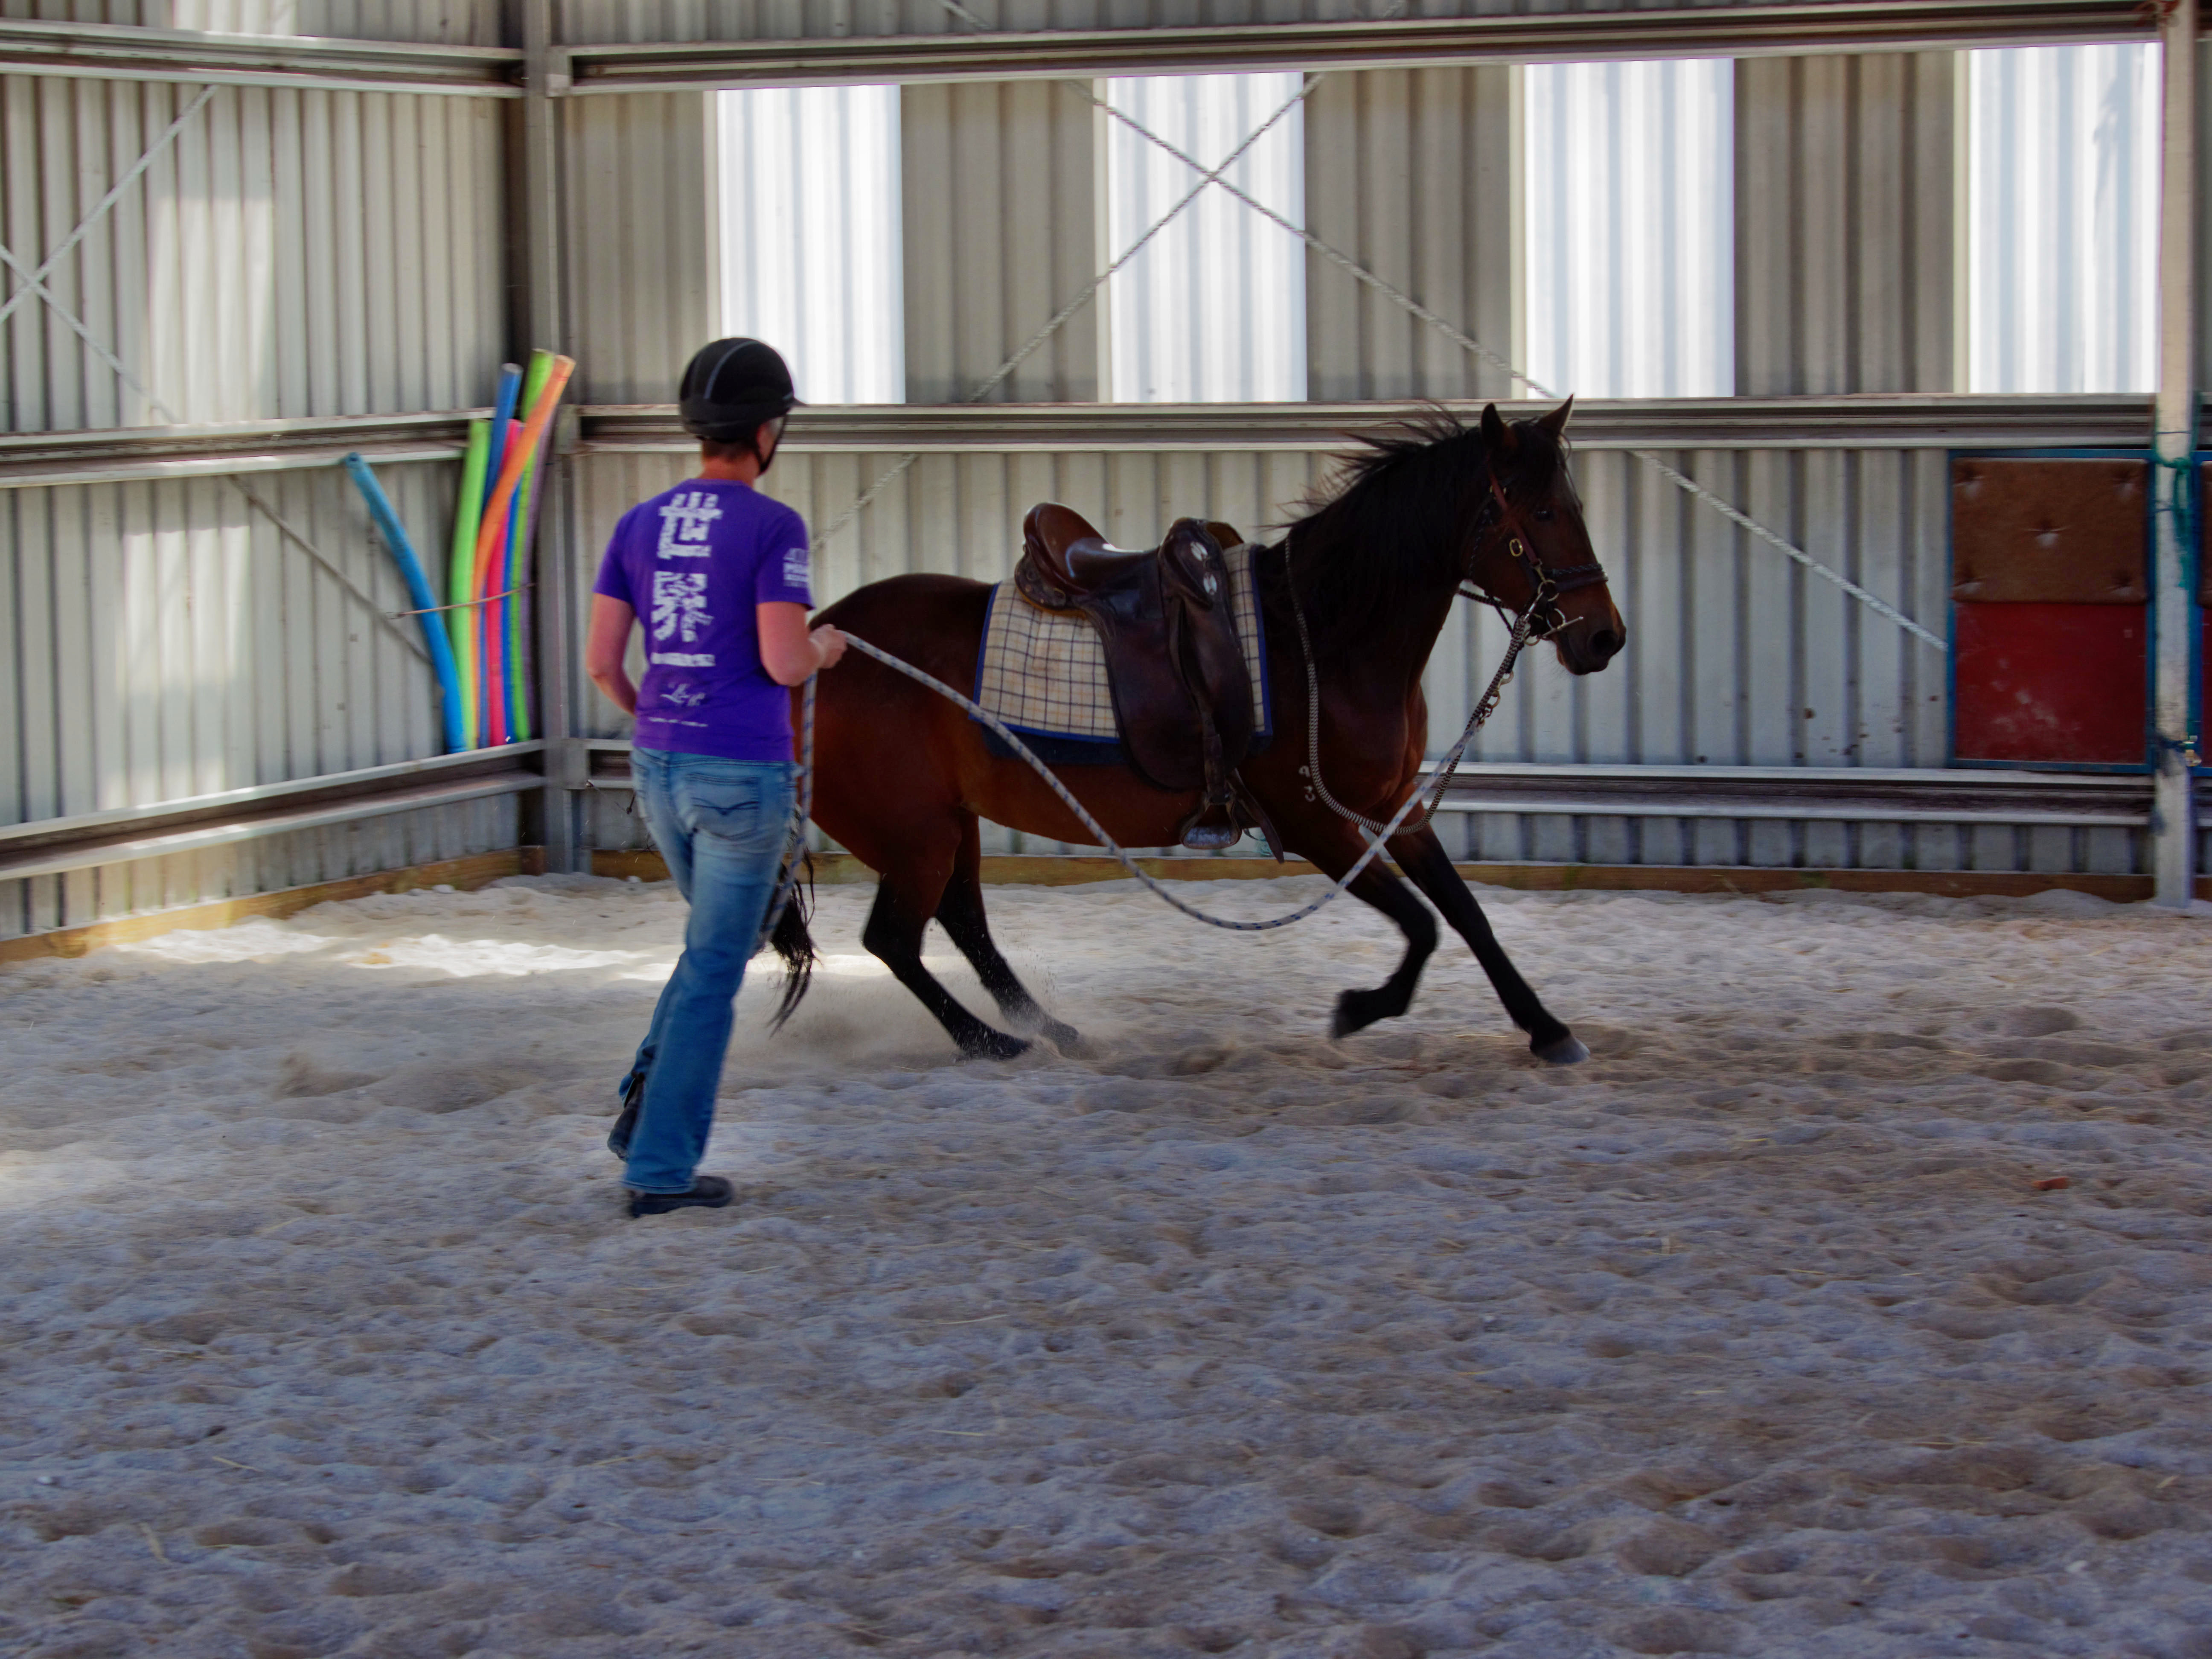 Horses-24.jpeg